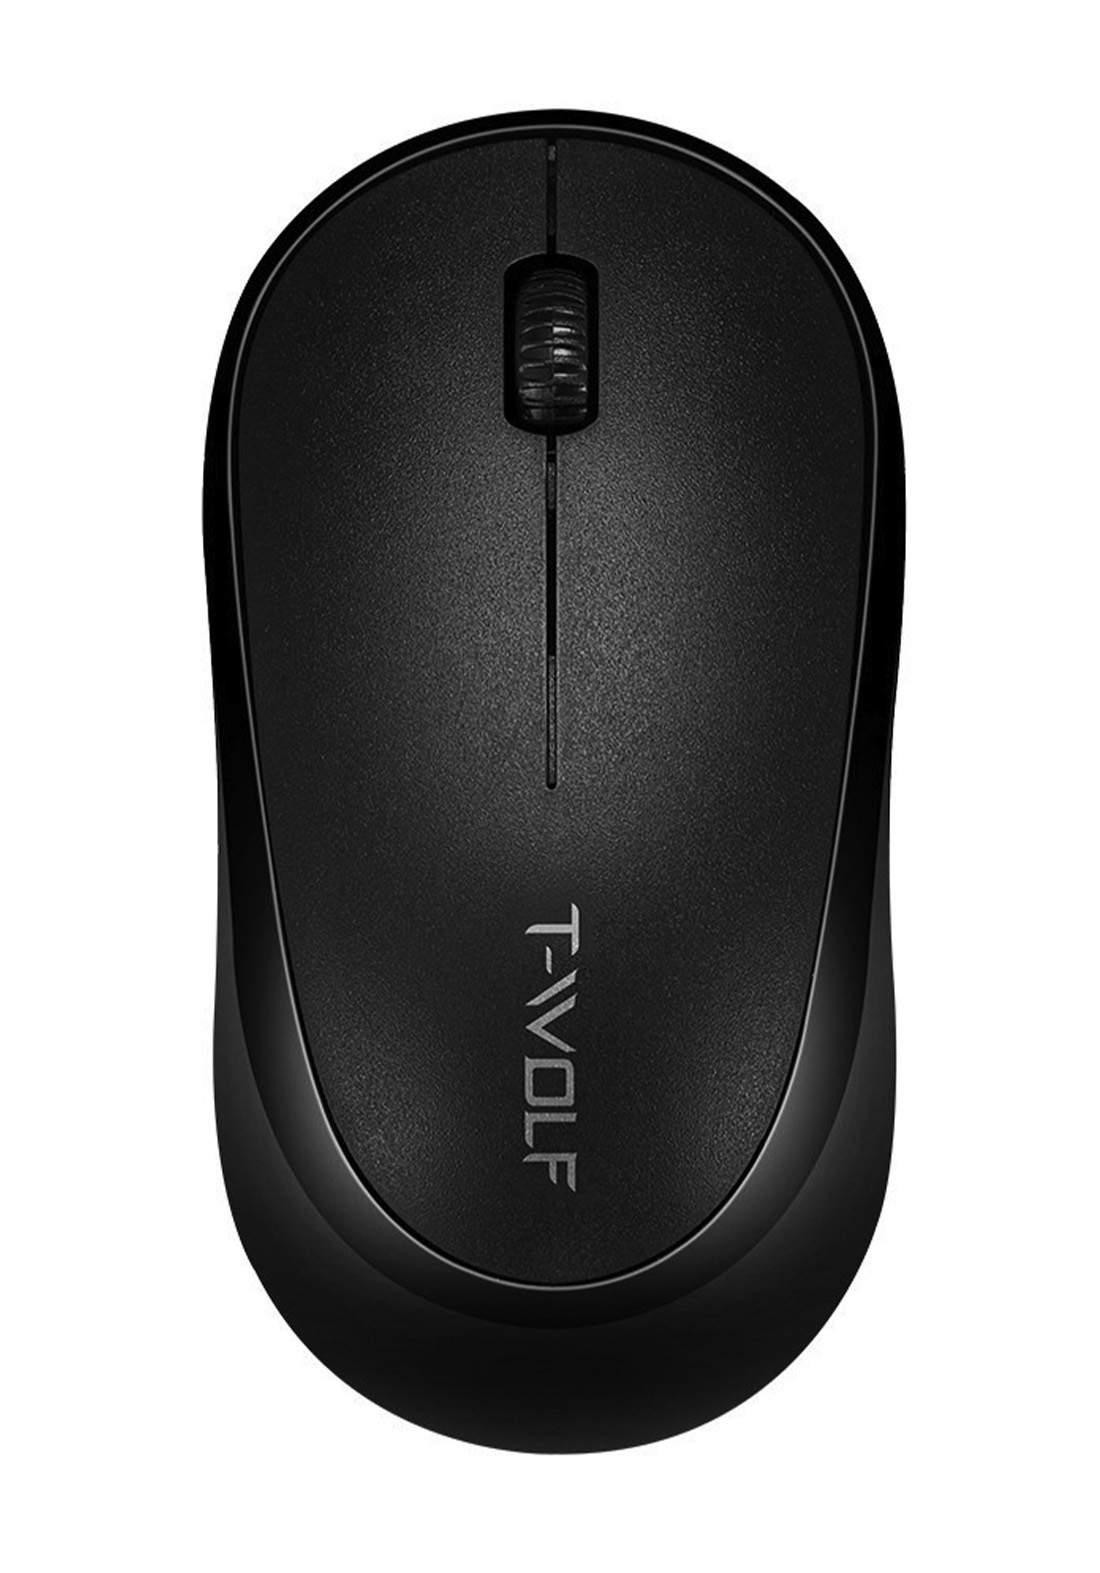 T-WOLF Q18  Gaming Wireless For Desktop, Laptop, TV Smart Box - Black  فأرة